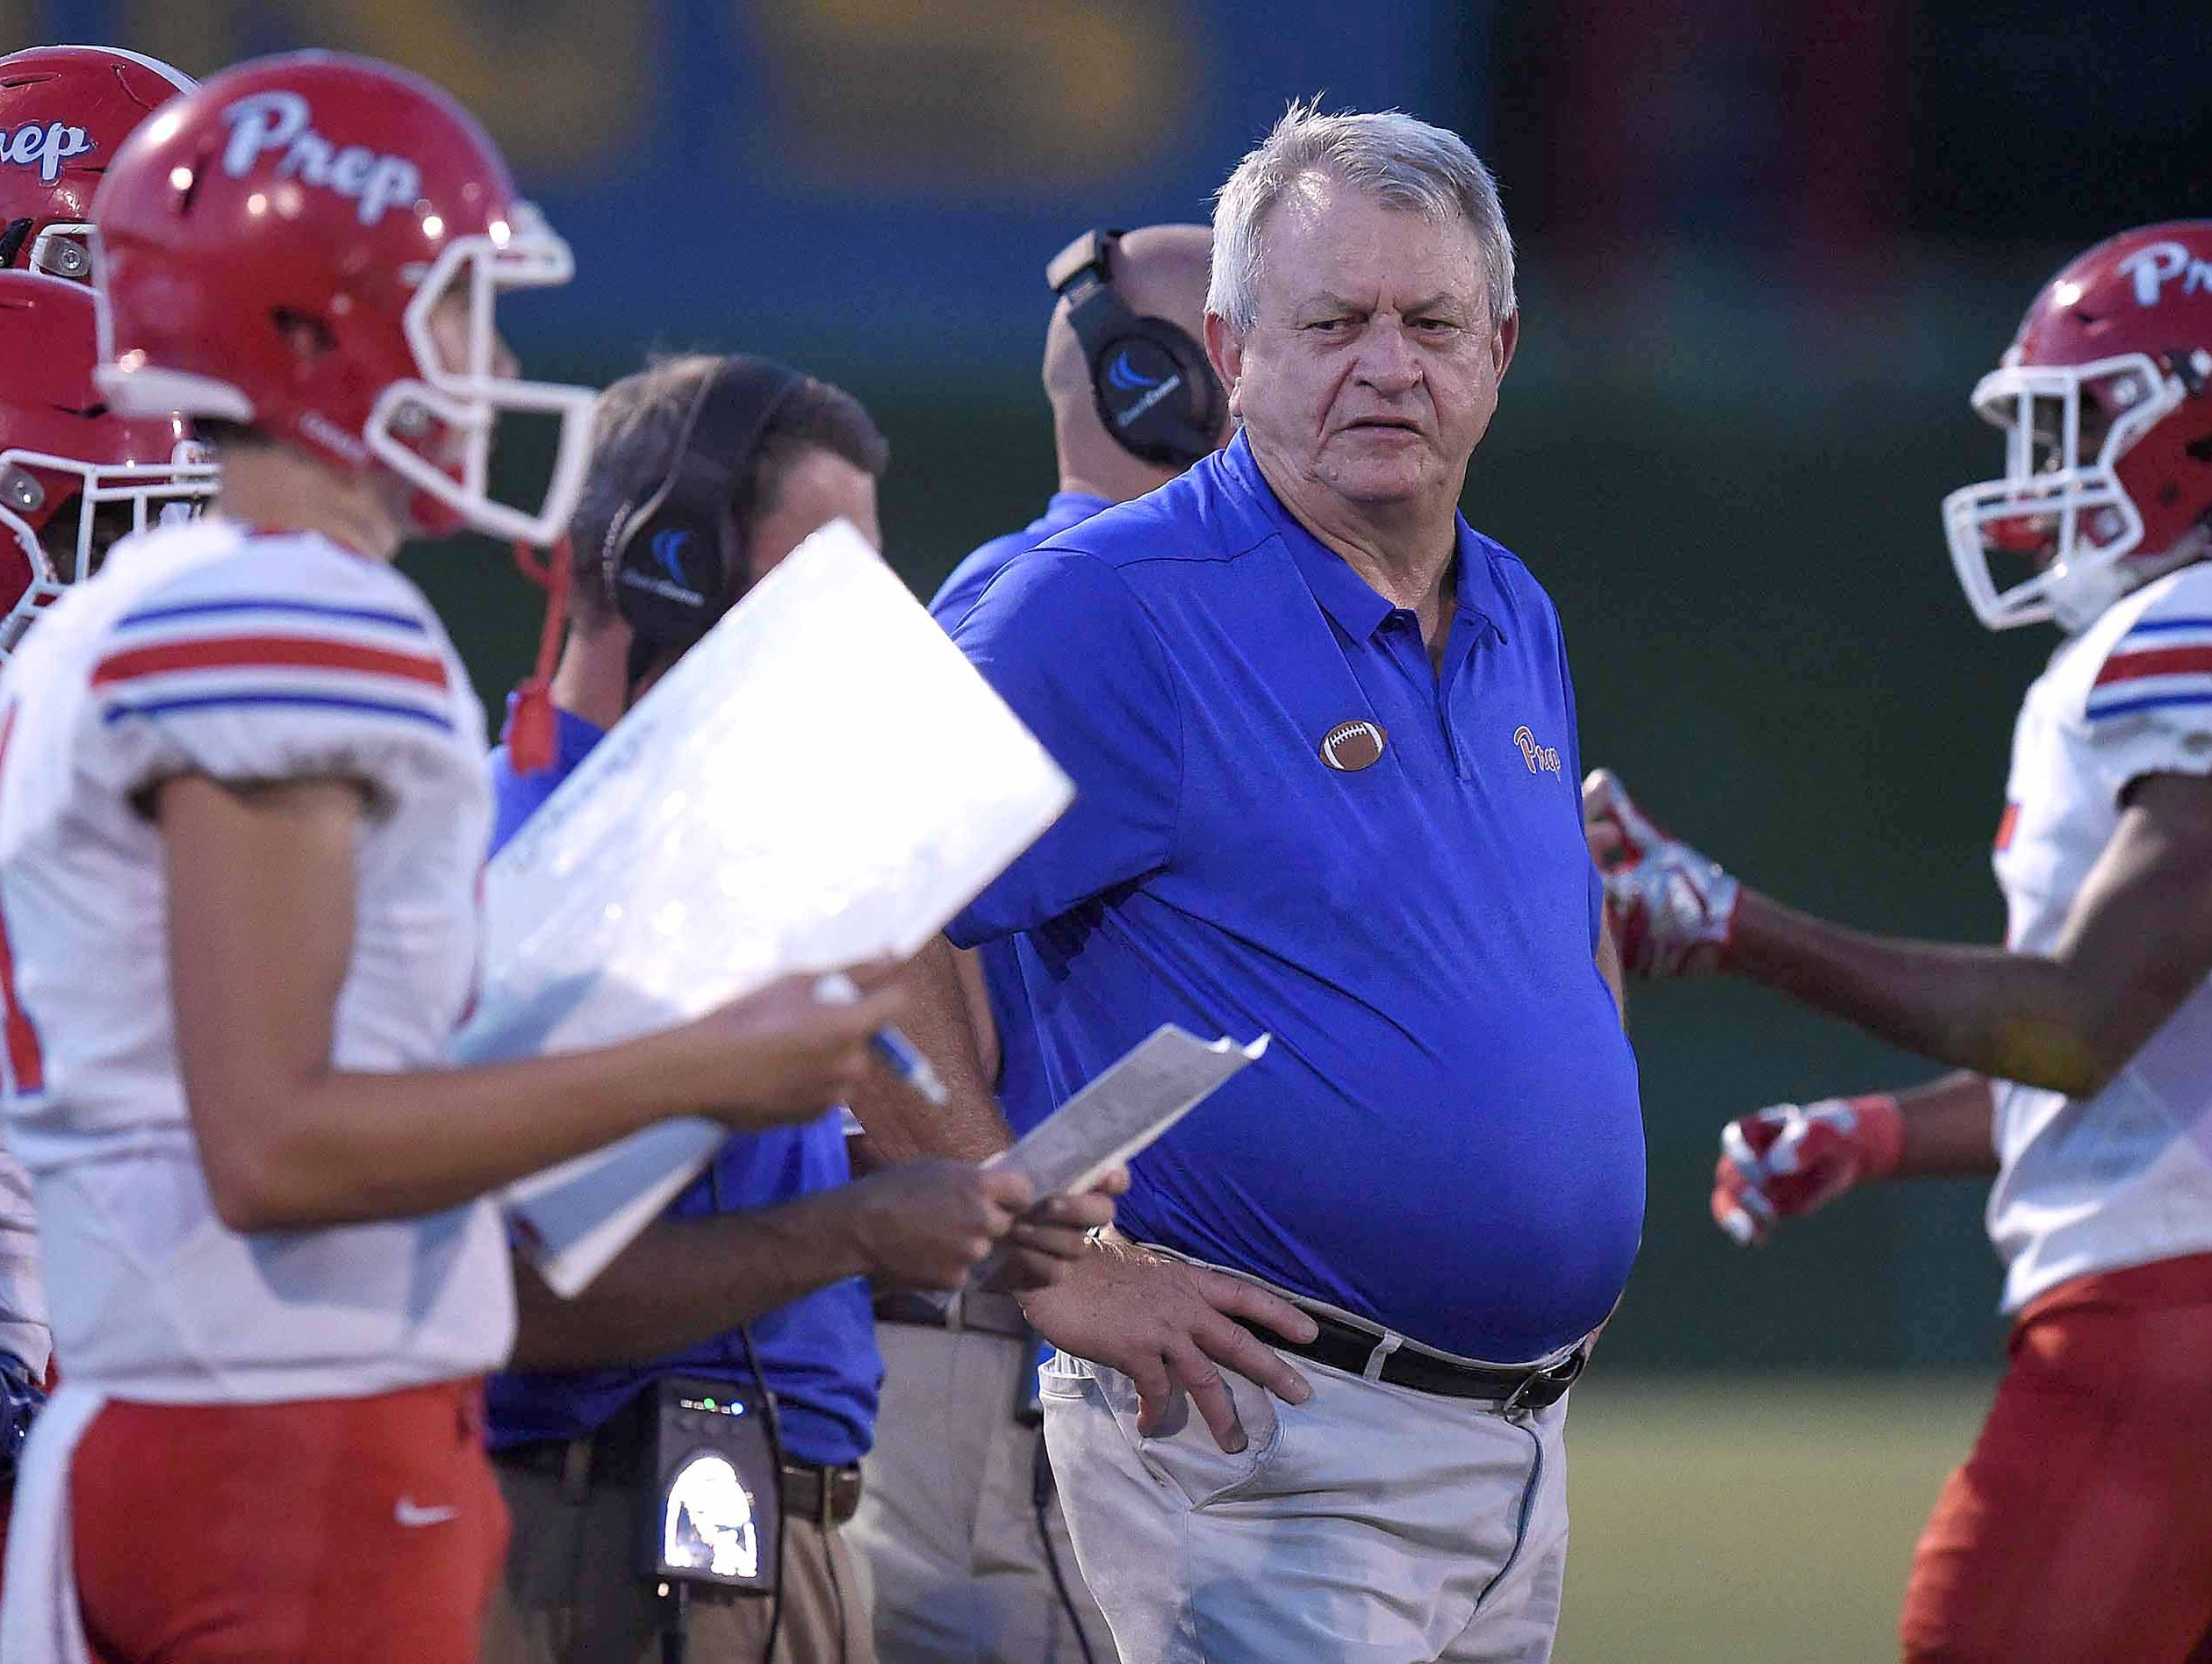 Prep head coach Ricky Black monitors the Patriots sideline on Friday, September 14, 2018, at St. Joseph Catholic School in Madison, Miss.